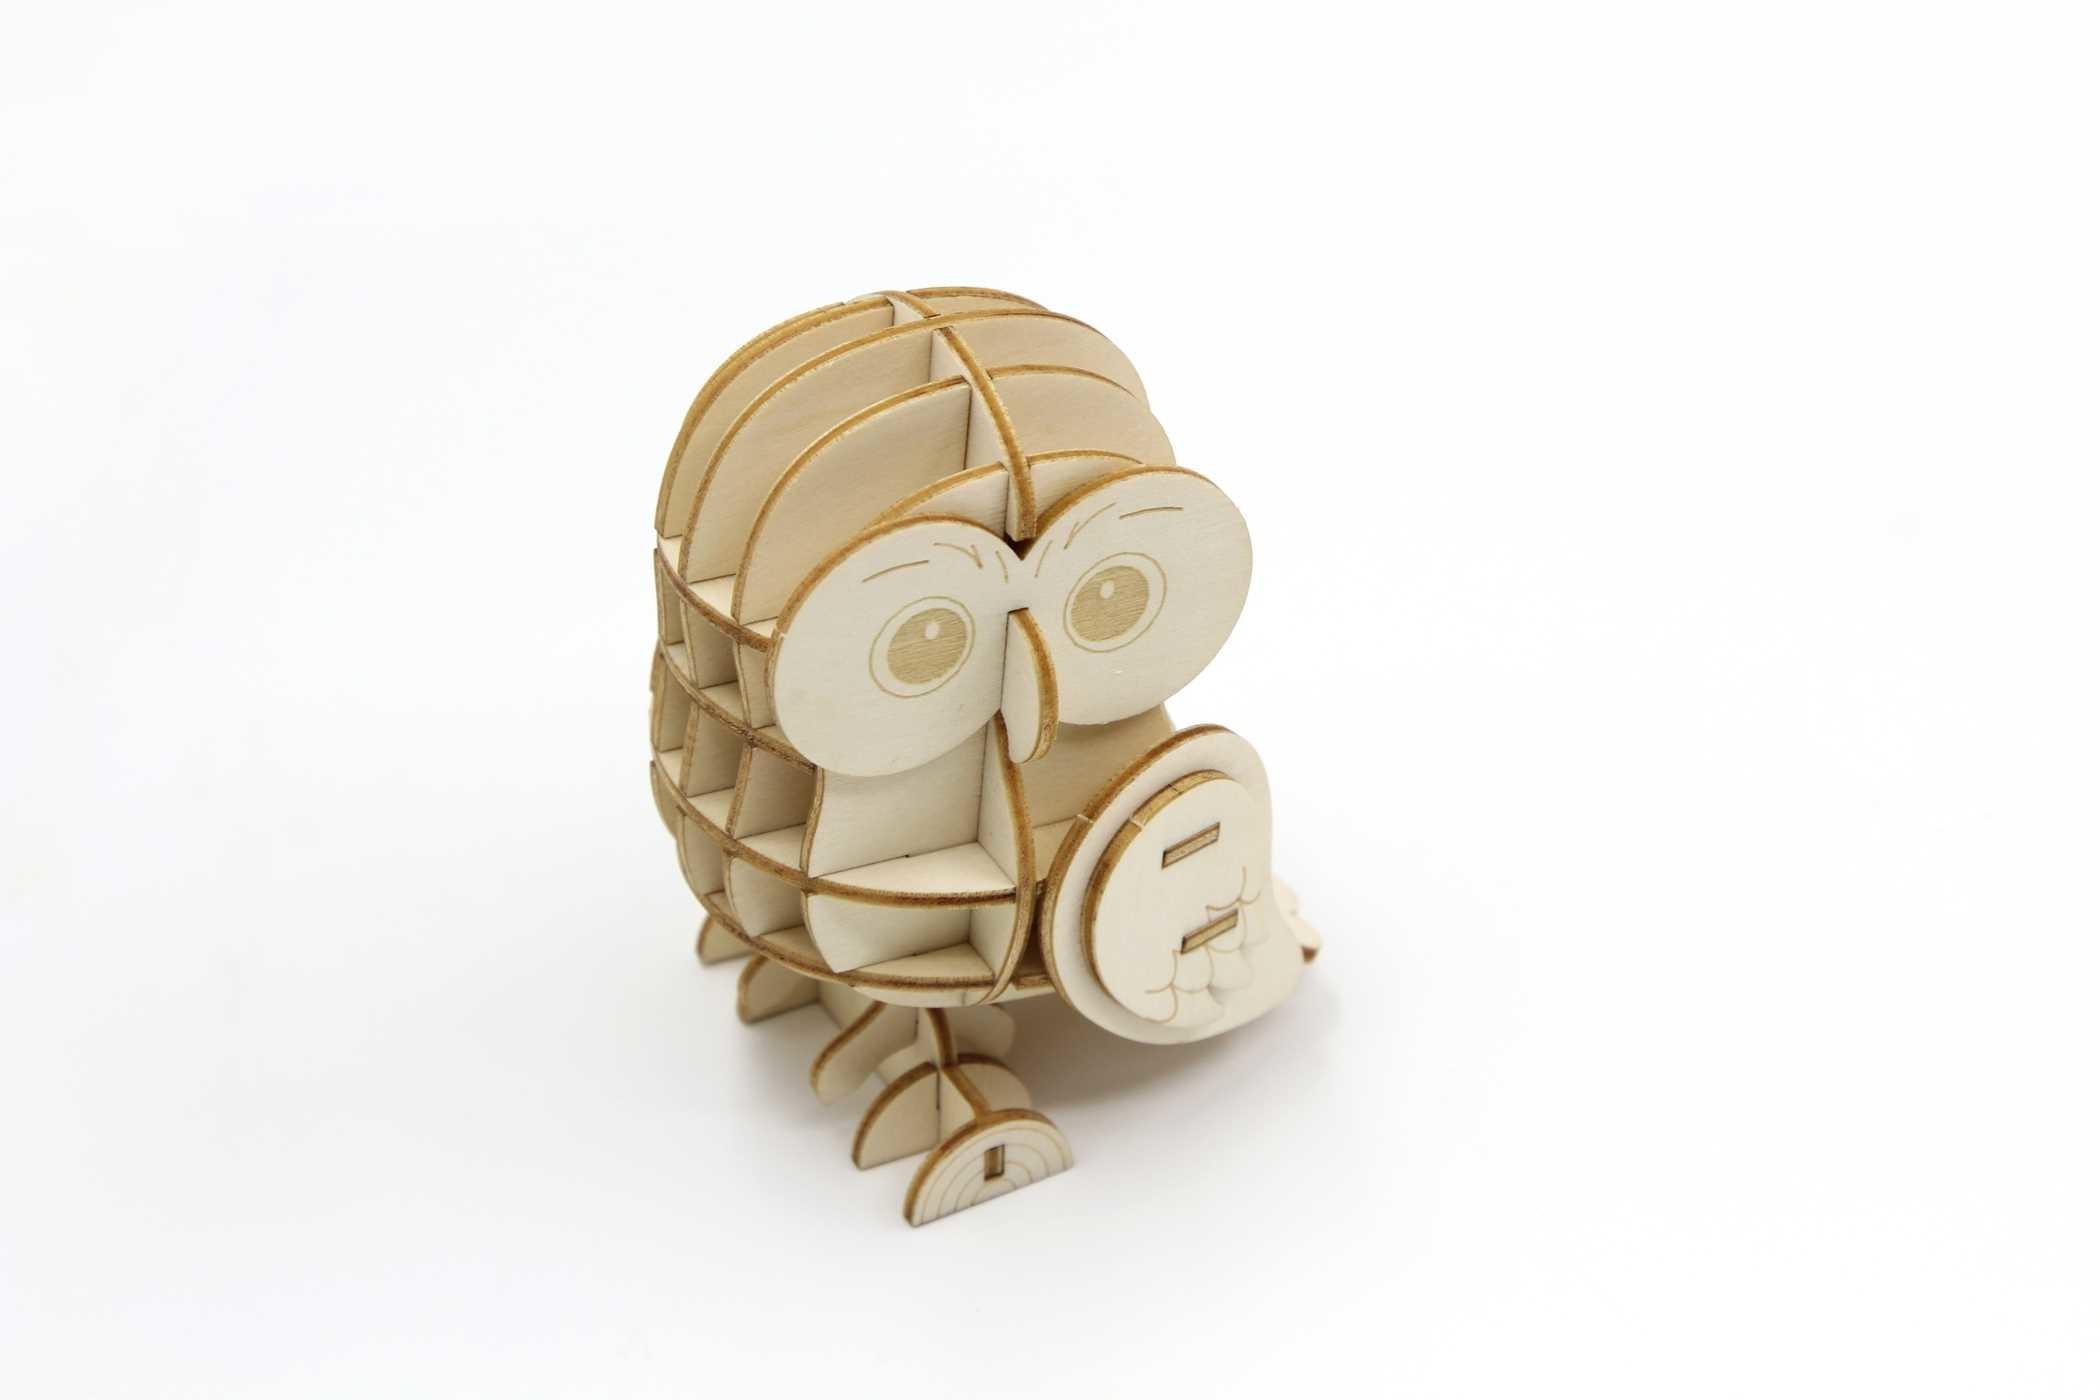 Incredibuilds owl 3d wood model 9781682980408.in02